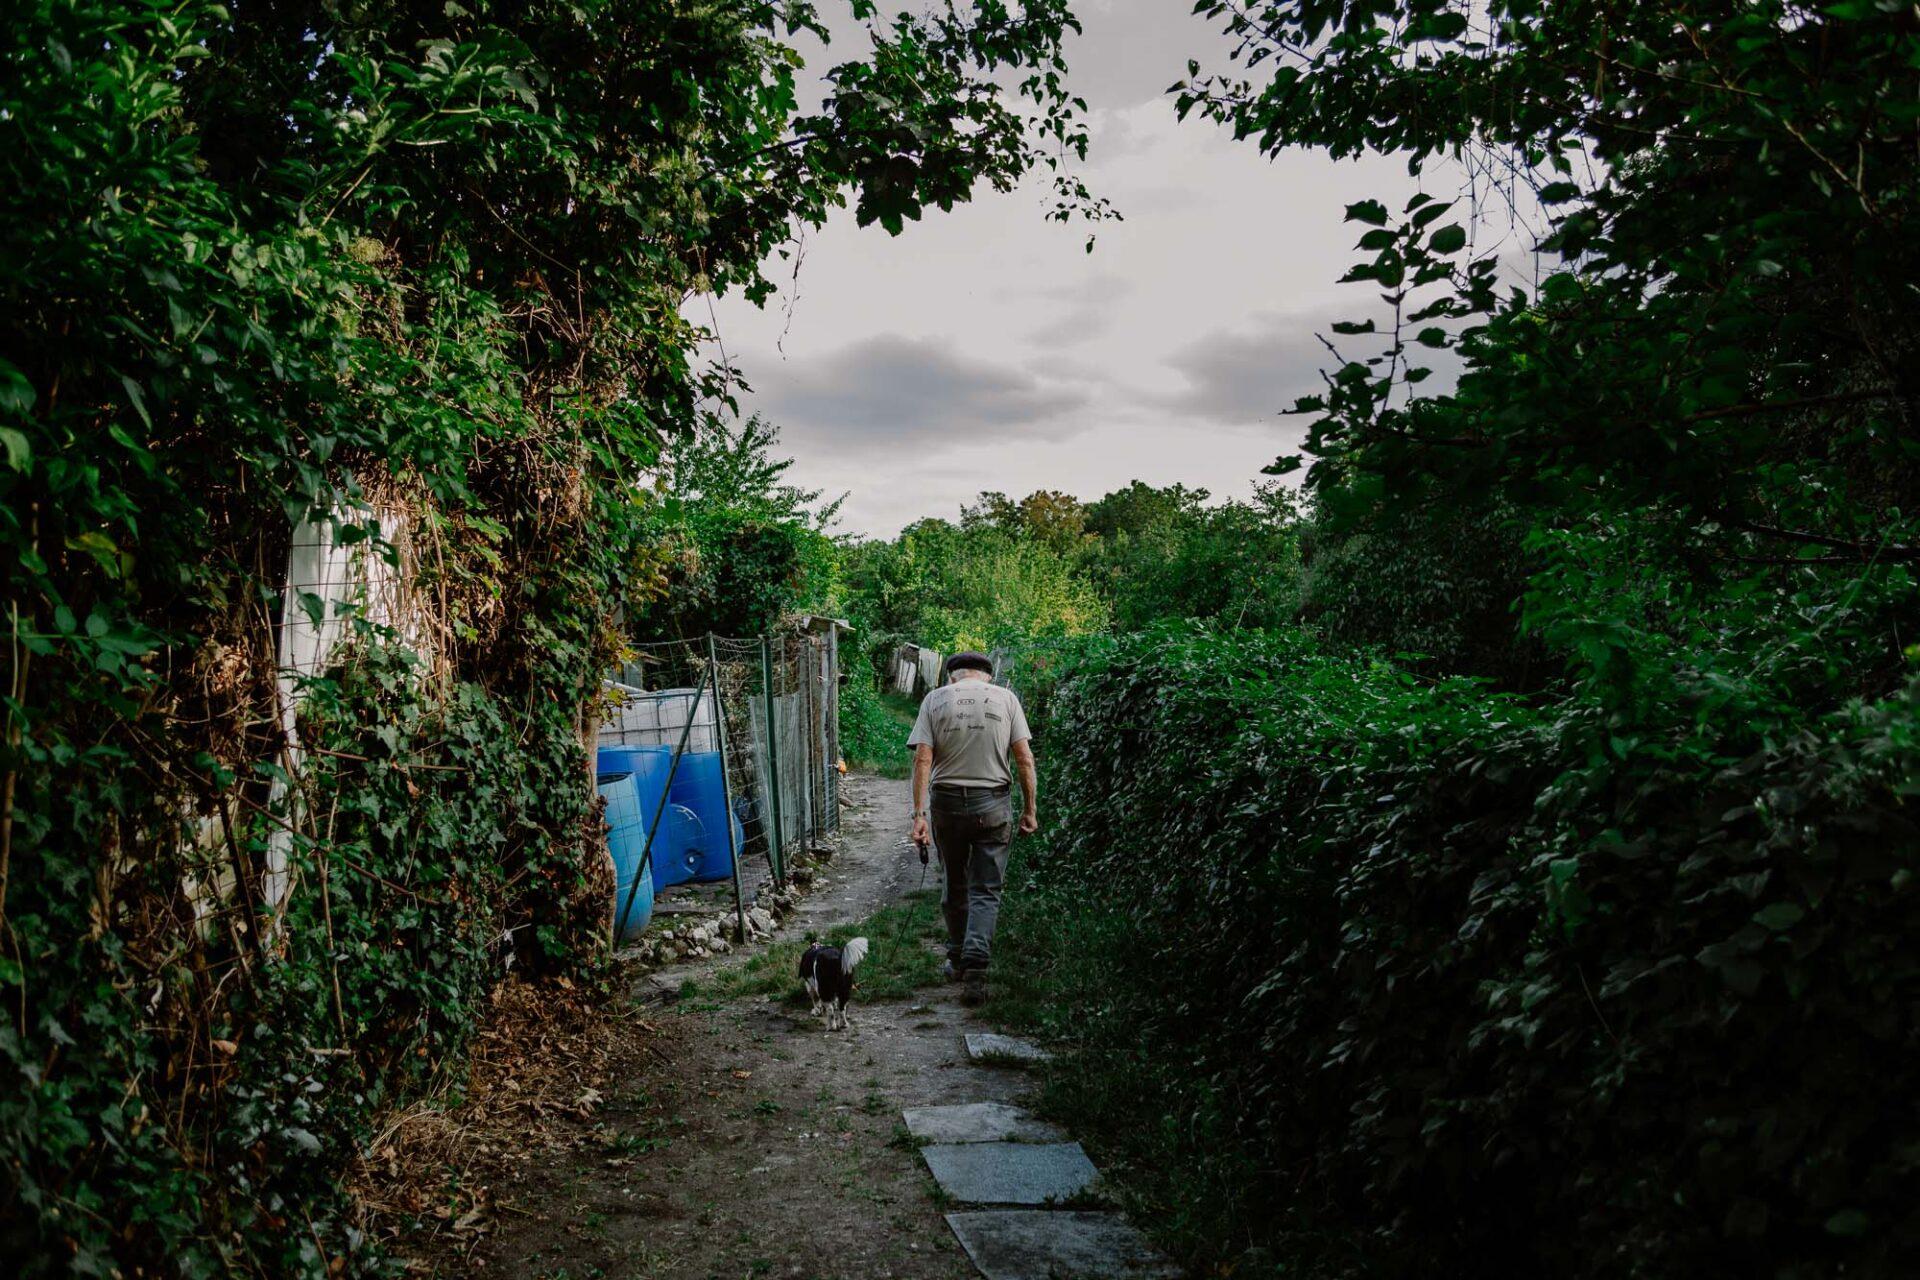 Jardins ouvriers aubervilliers 6 - Dagmara Bojenko - Eco-conscious Weddings, Births & Families